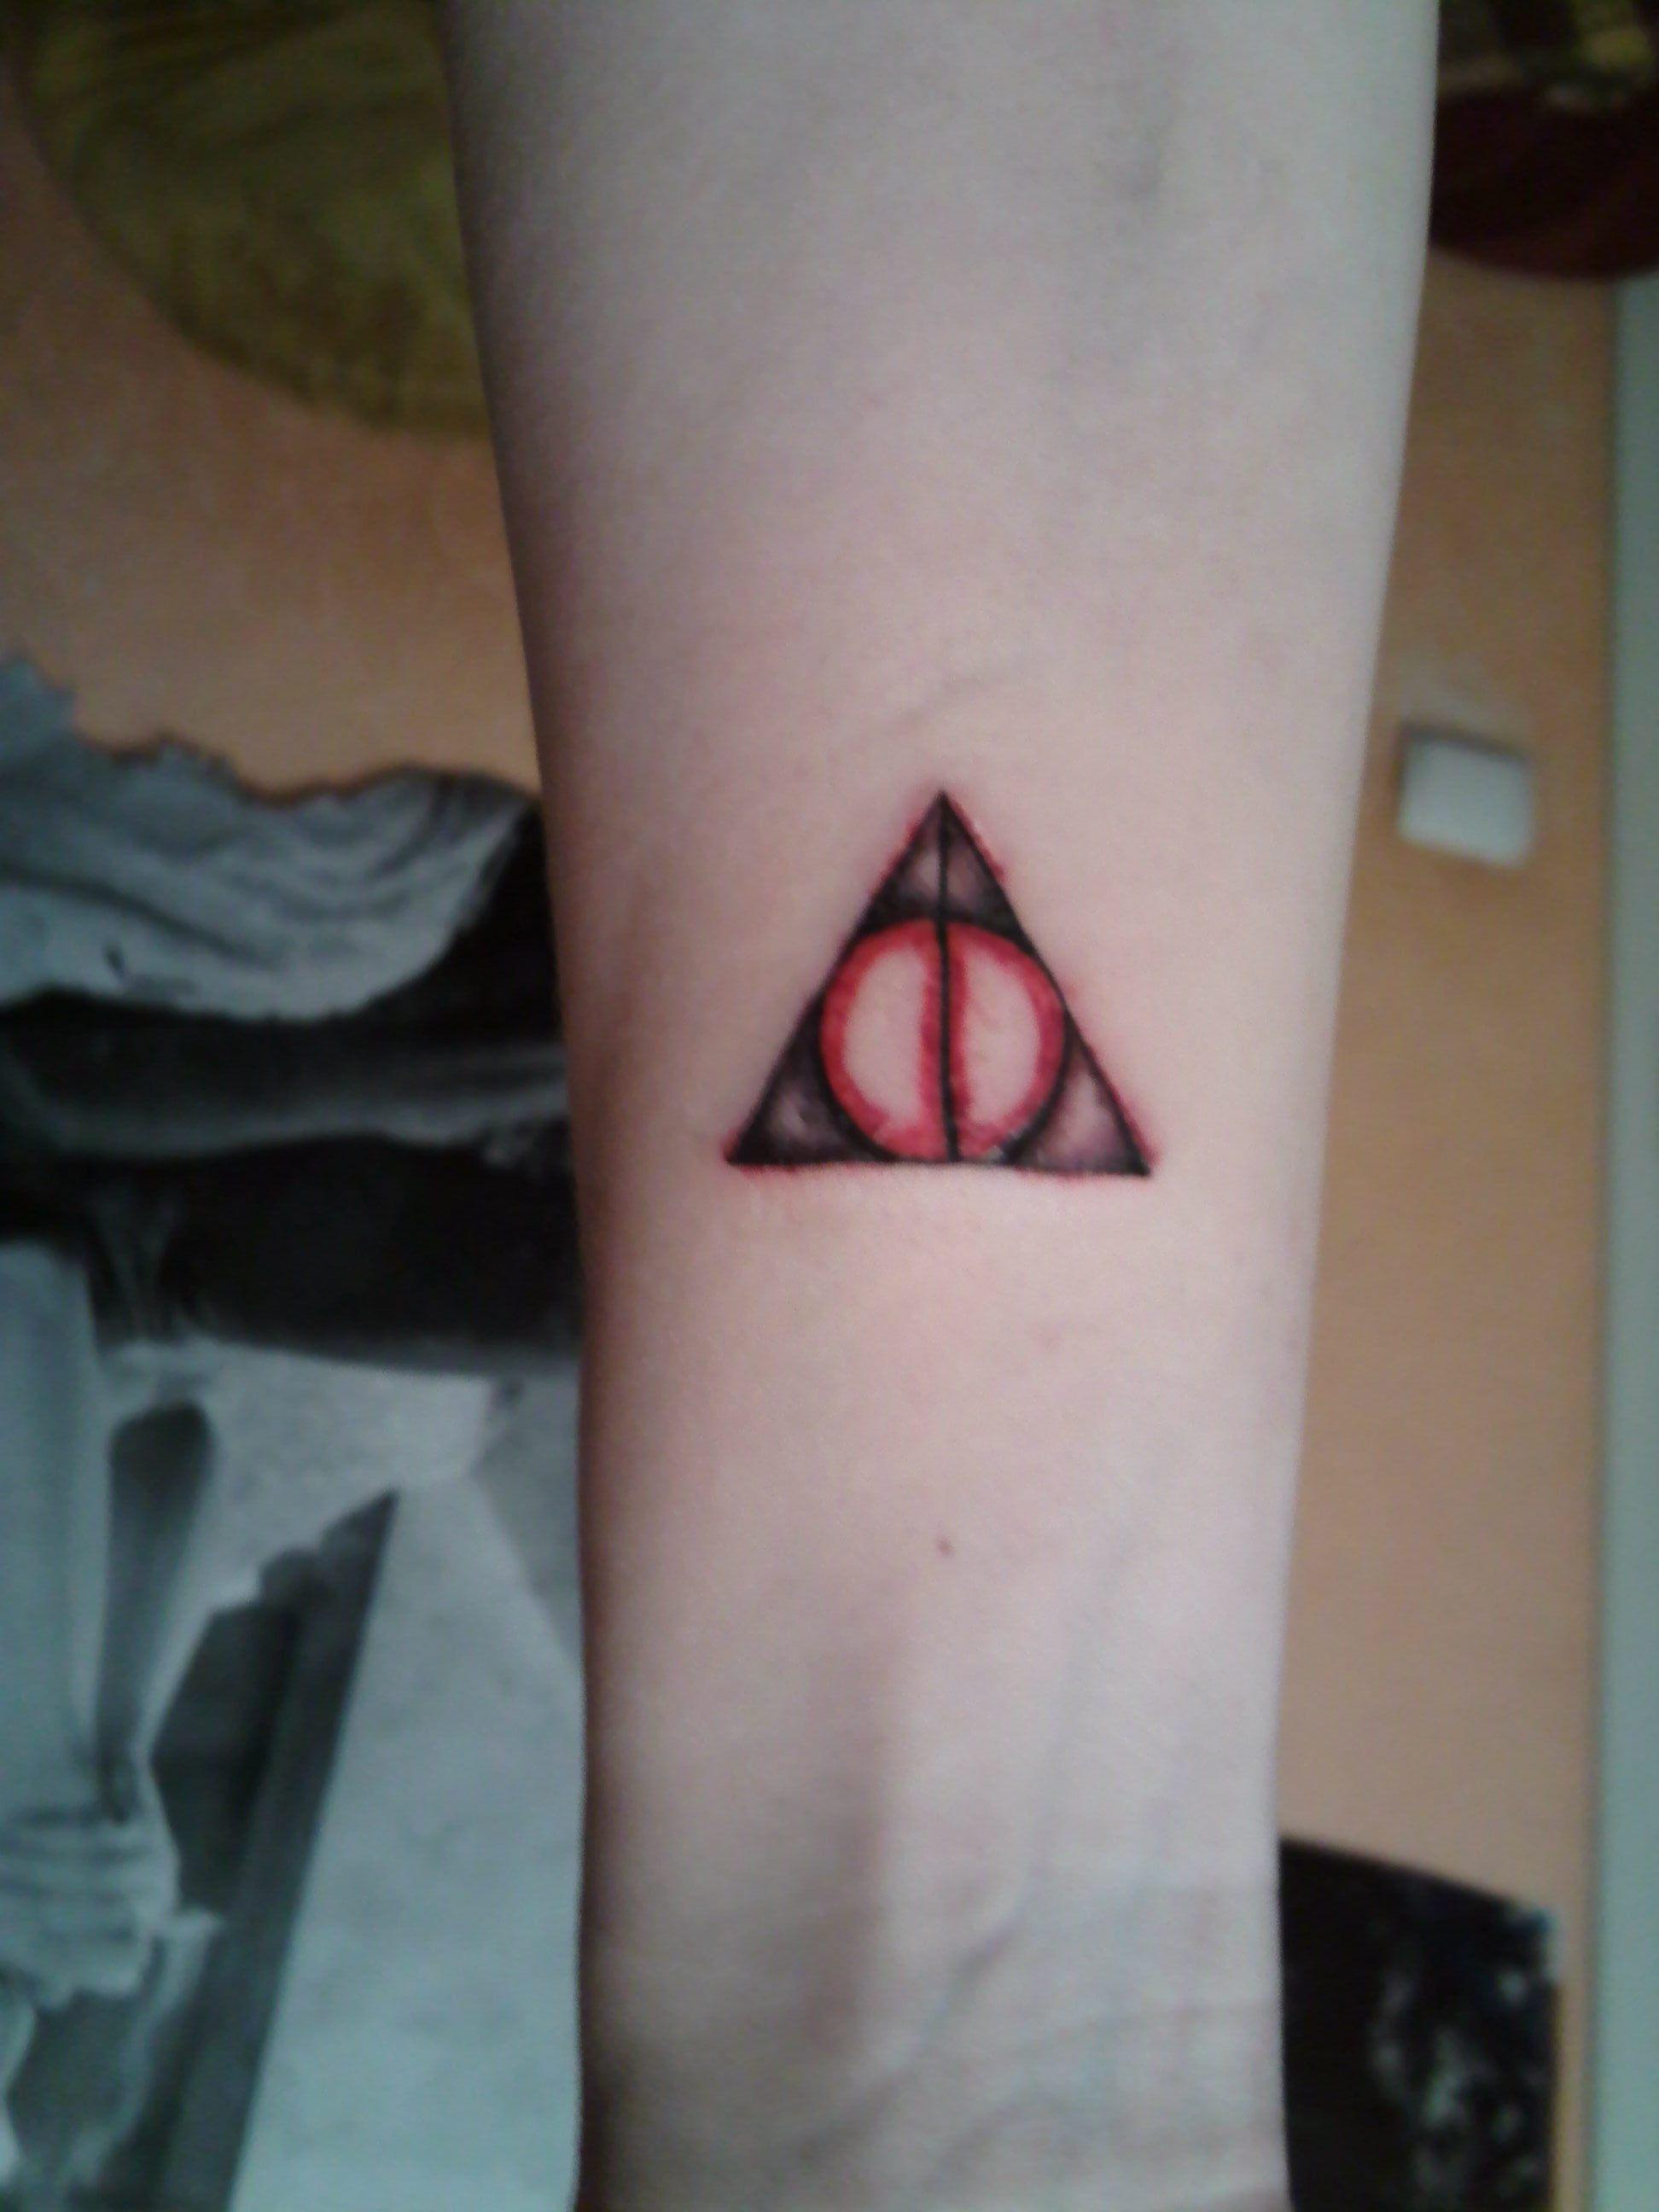 Deathly Hallows tattoo by diiwaanc